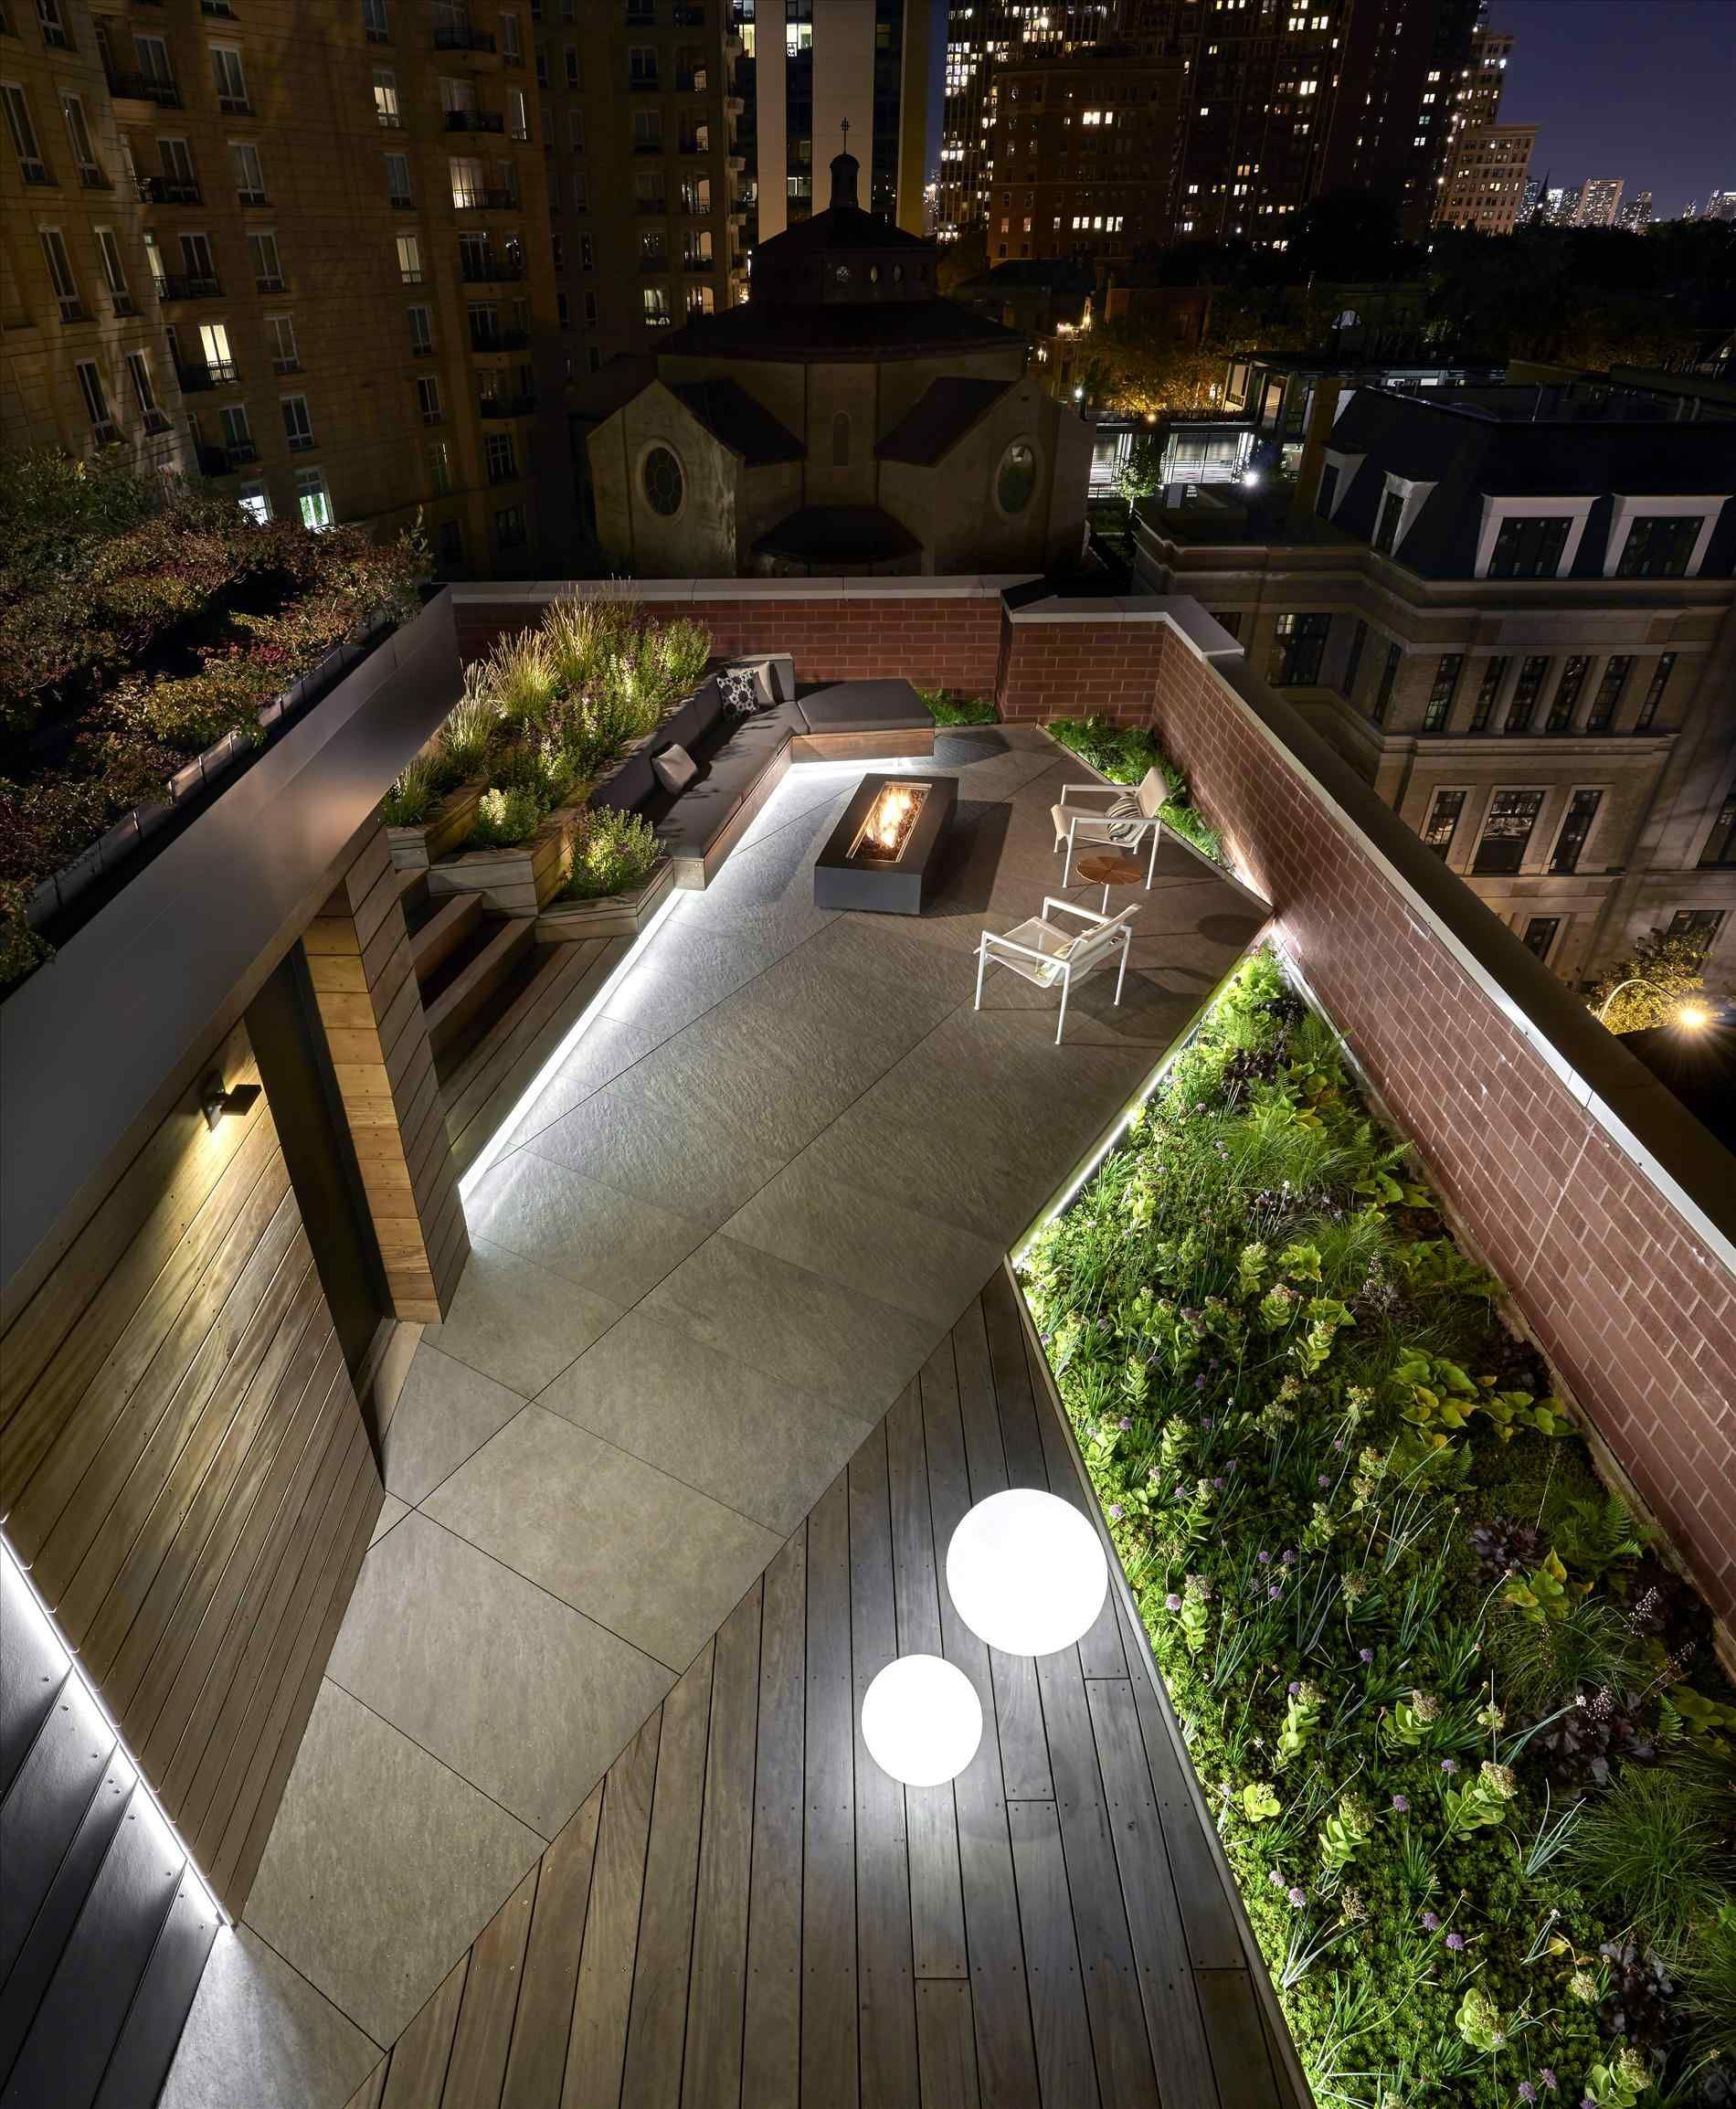 Chicago Lighting Company: 옥상 정원, 정원, 건축